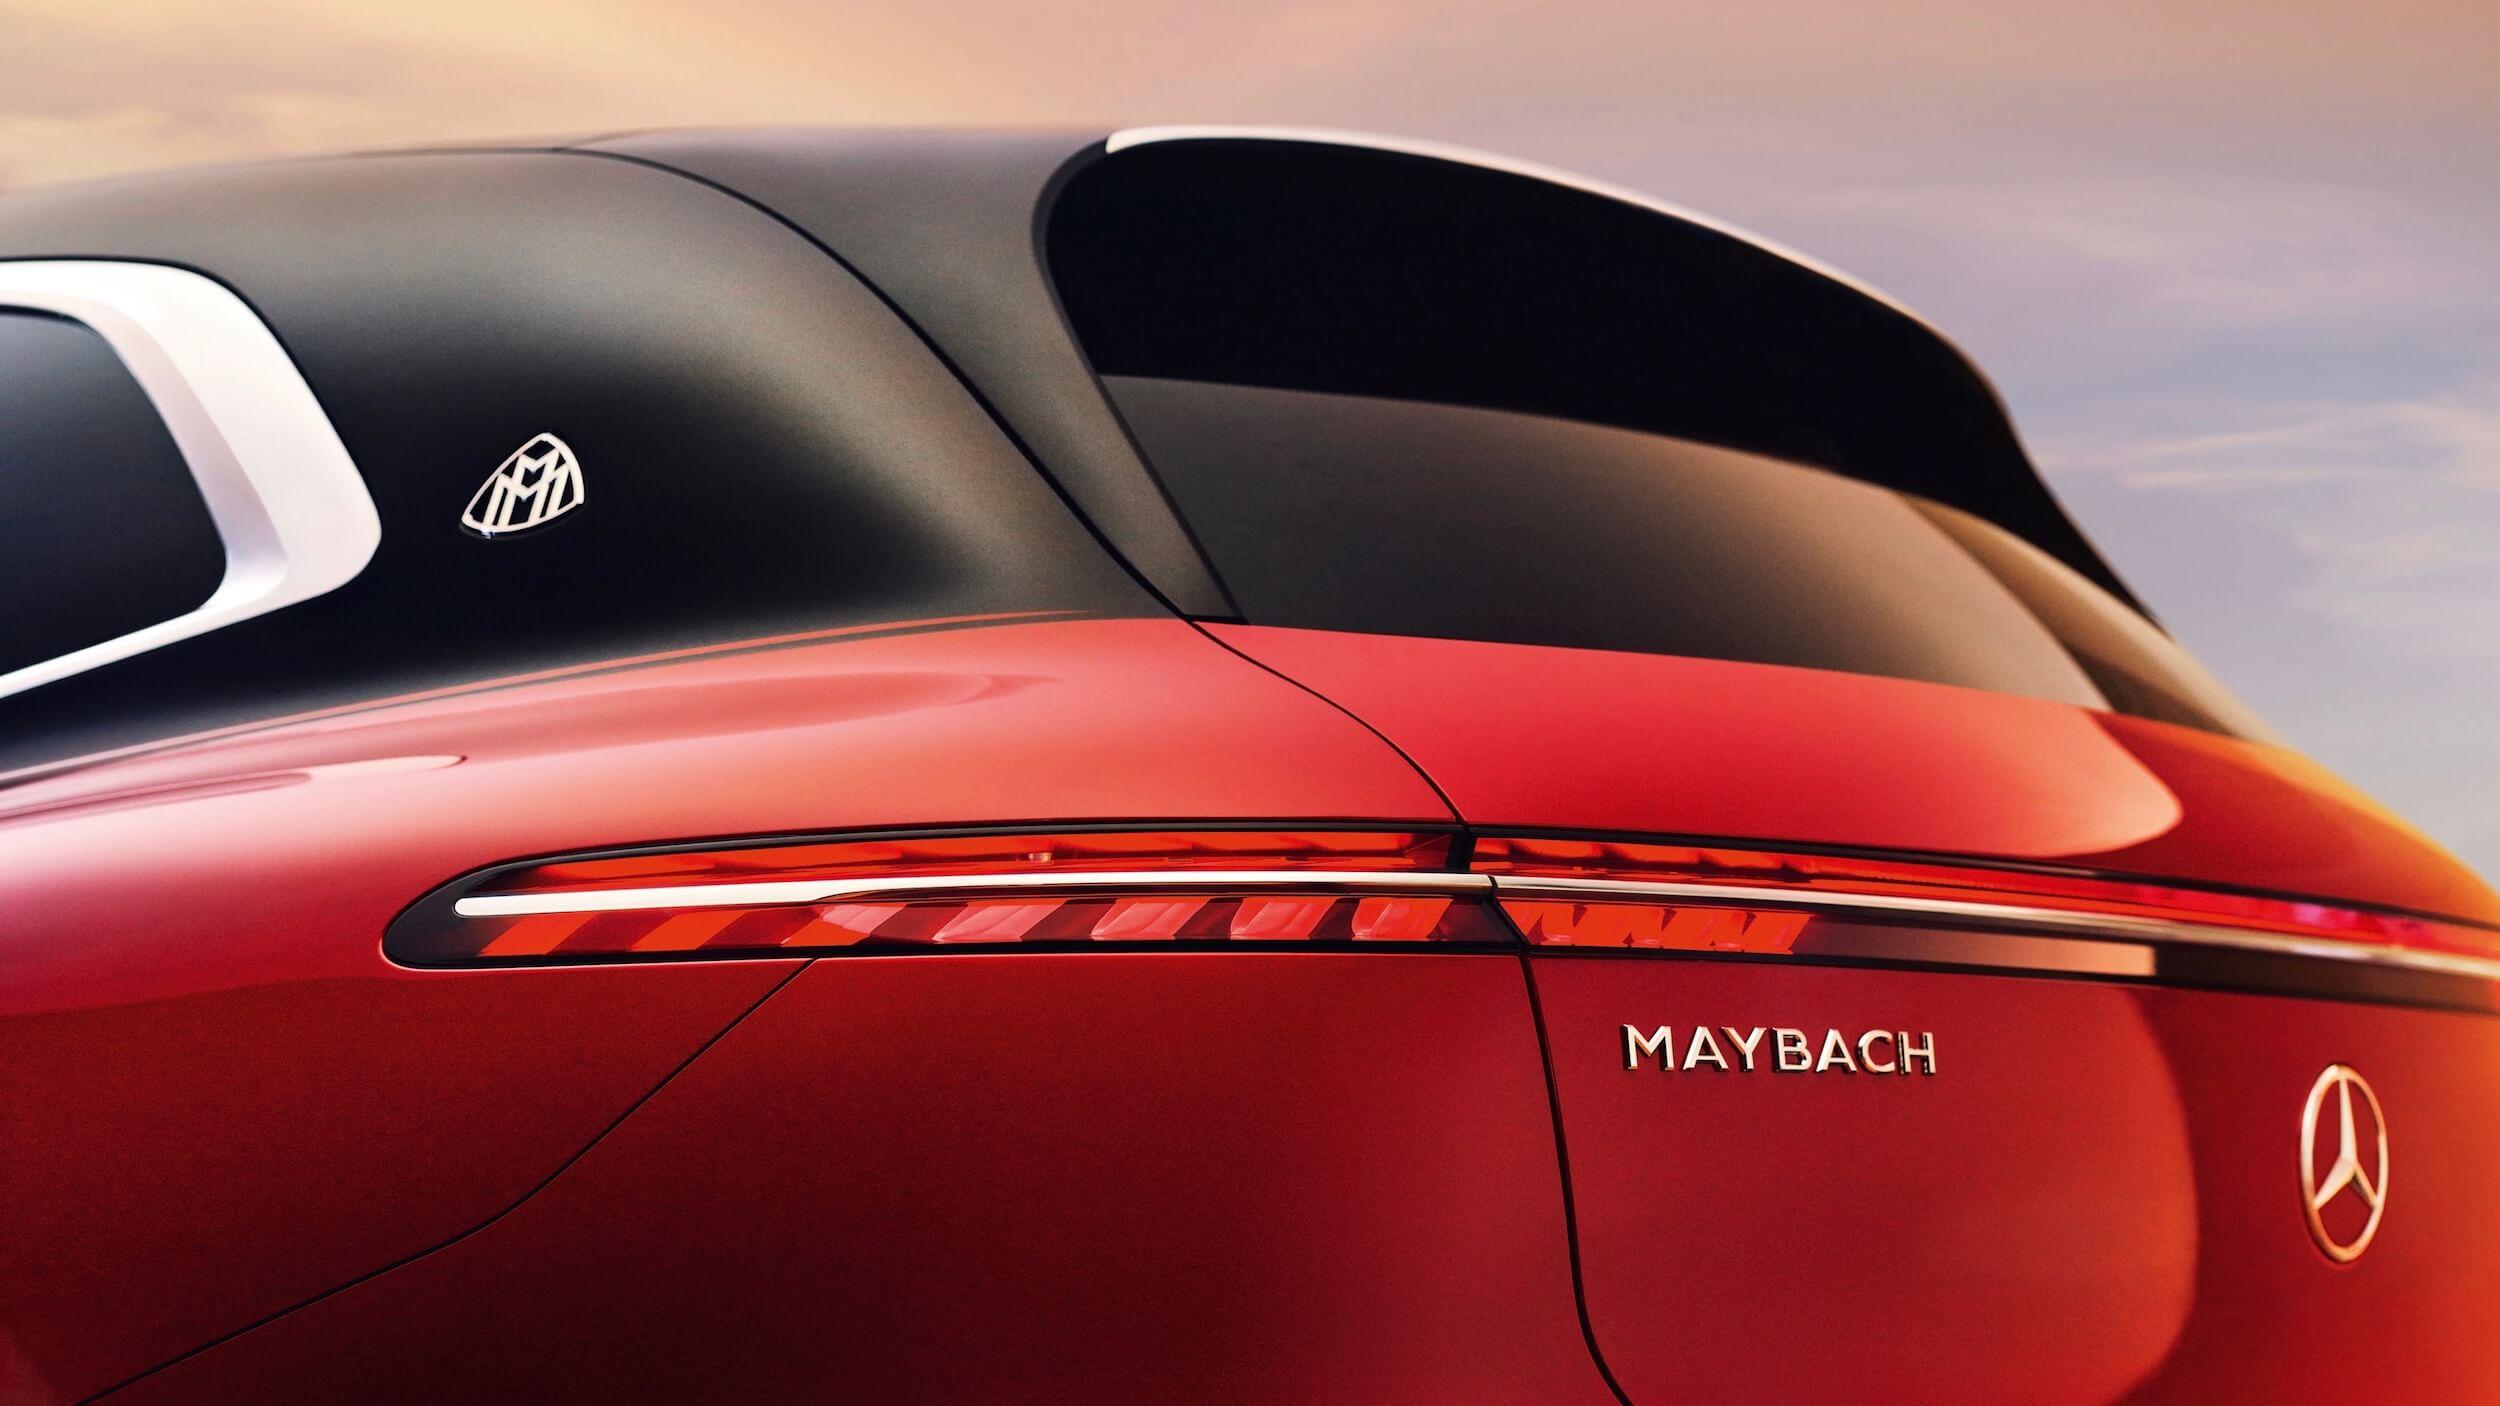 Mercedes Maybach EQS Concept 2